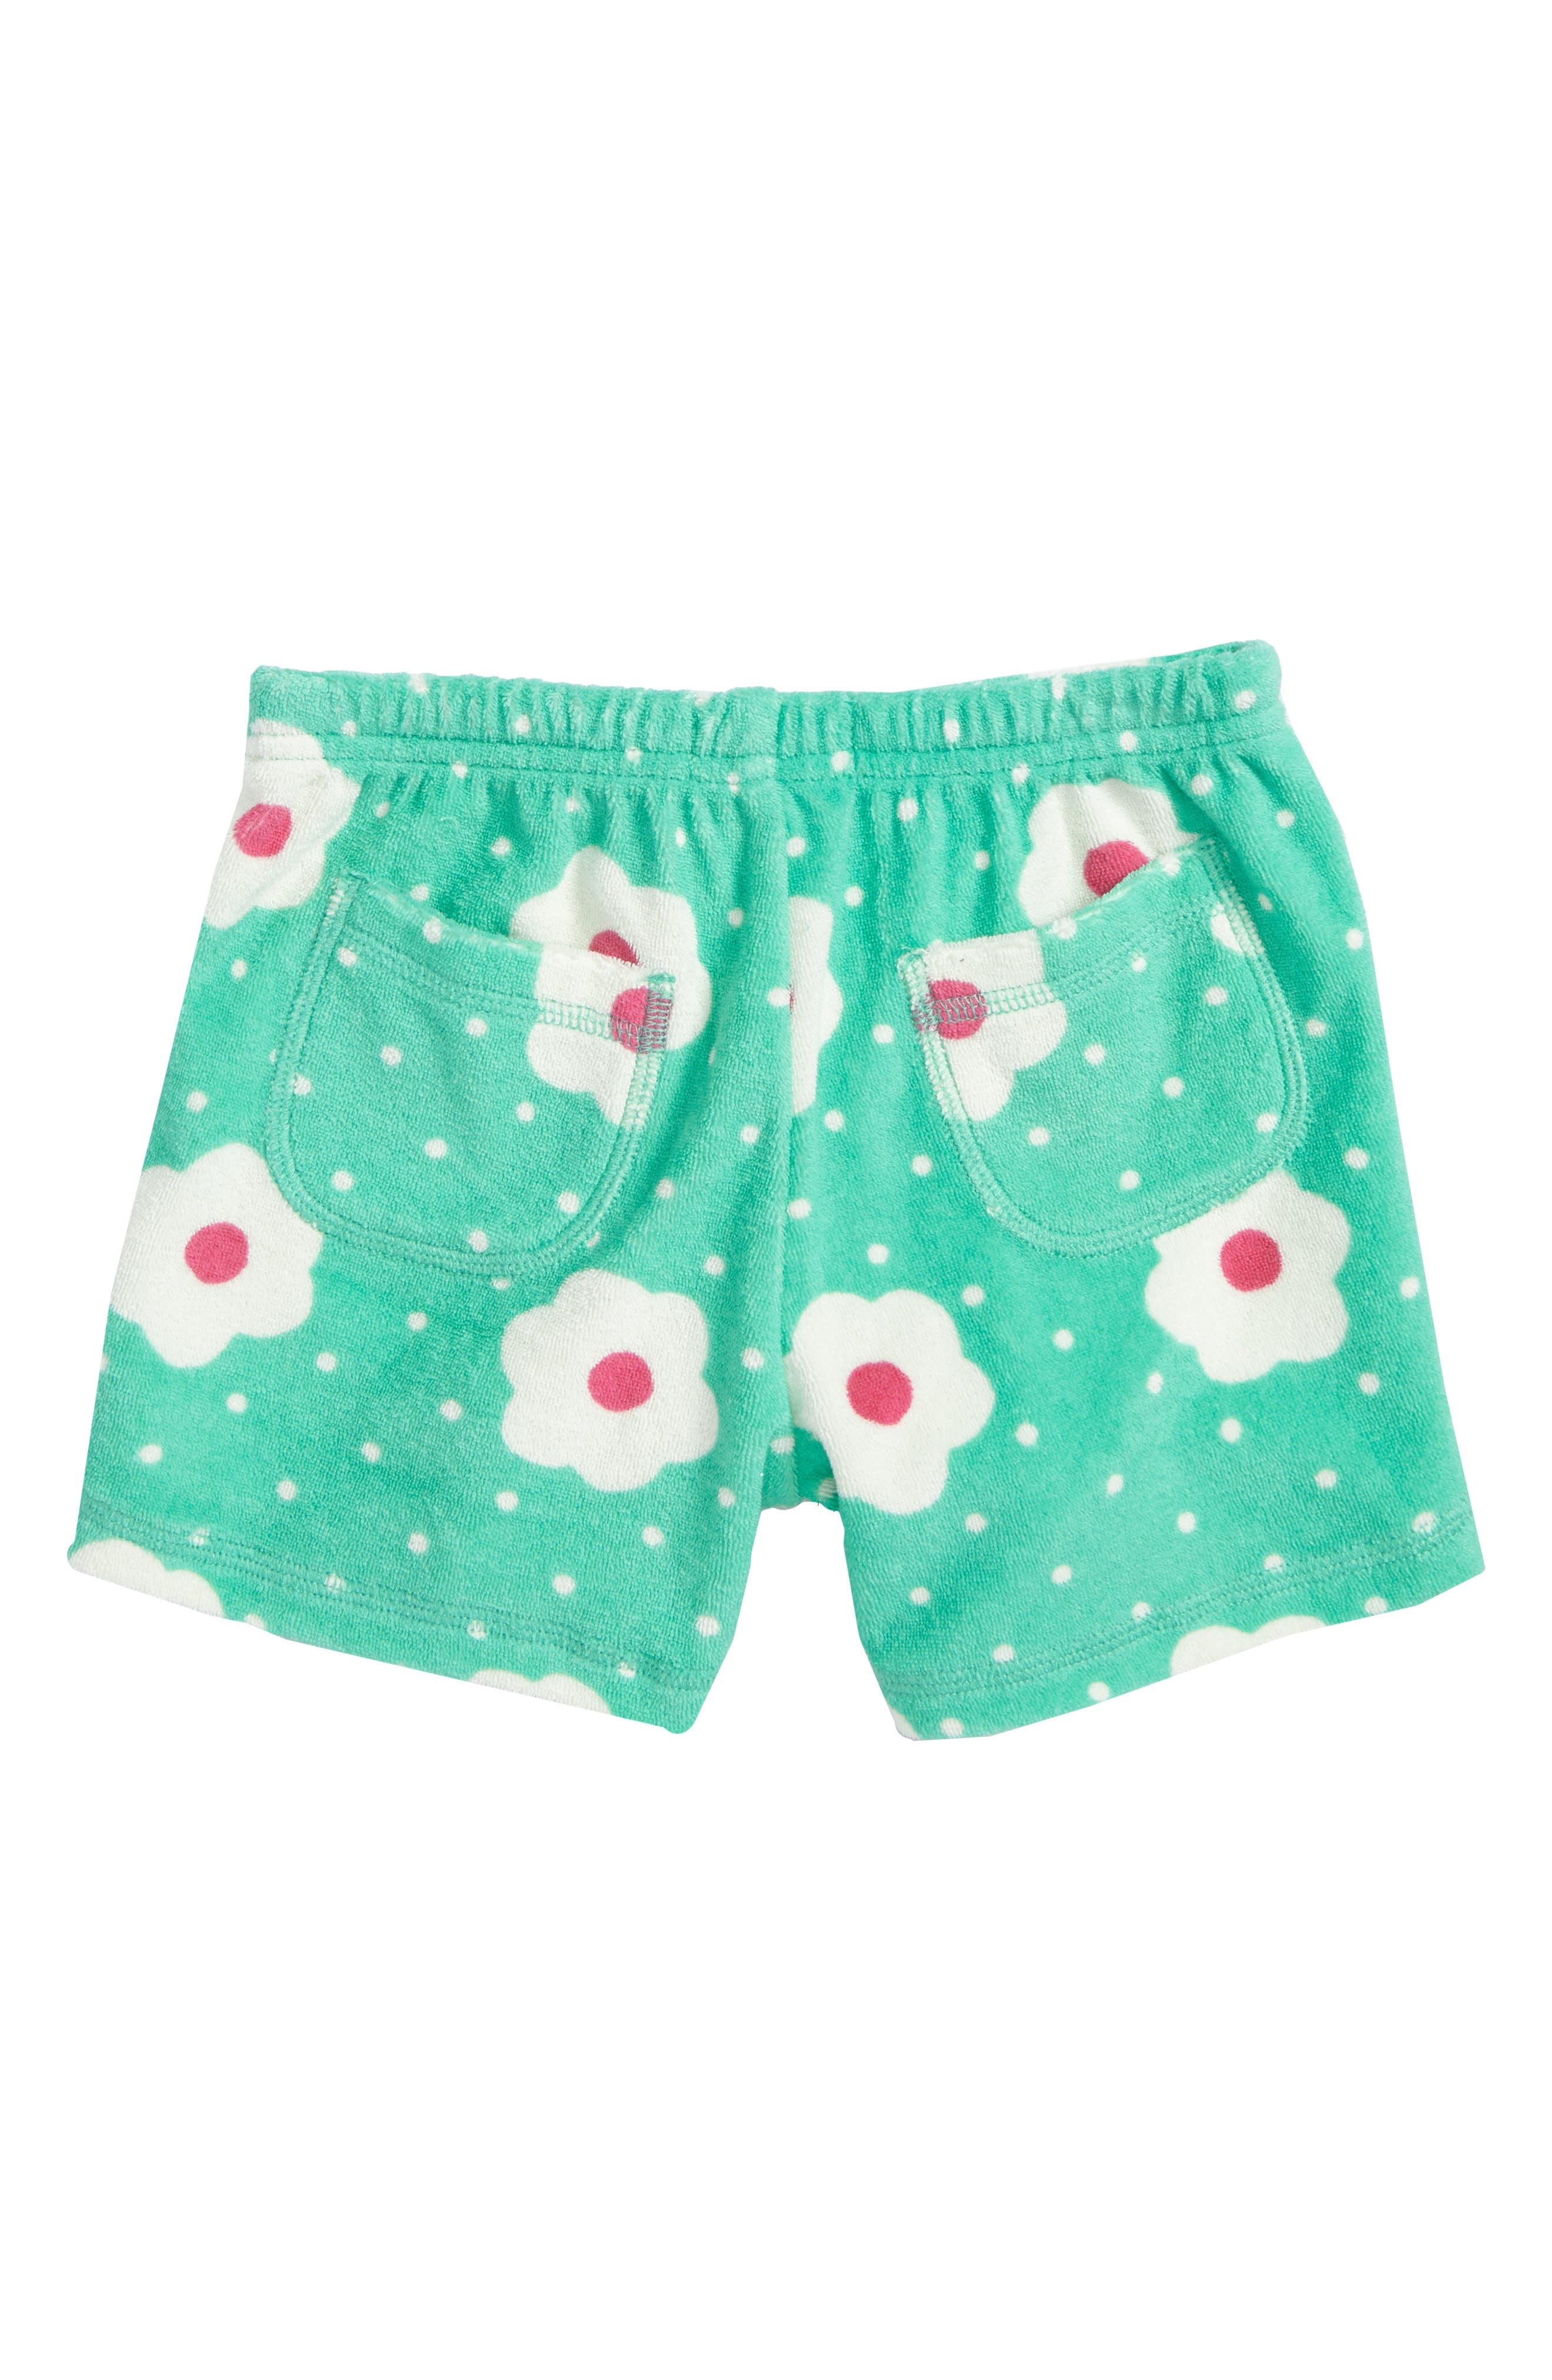 Adventure Toweling Shorts,                             Alternate thumbnail 3, color,